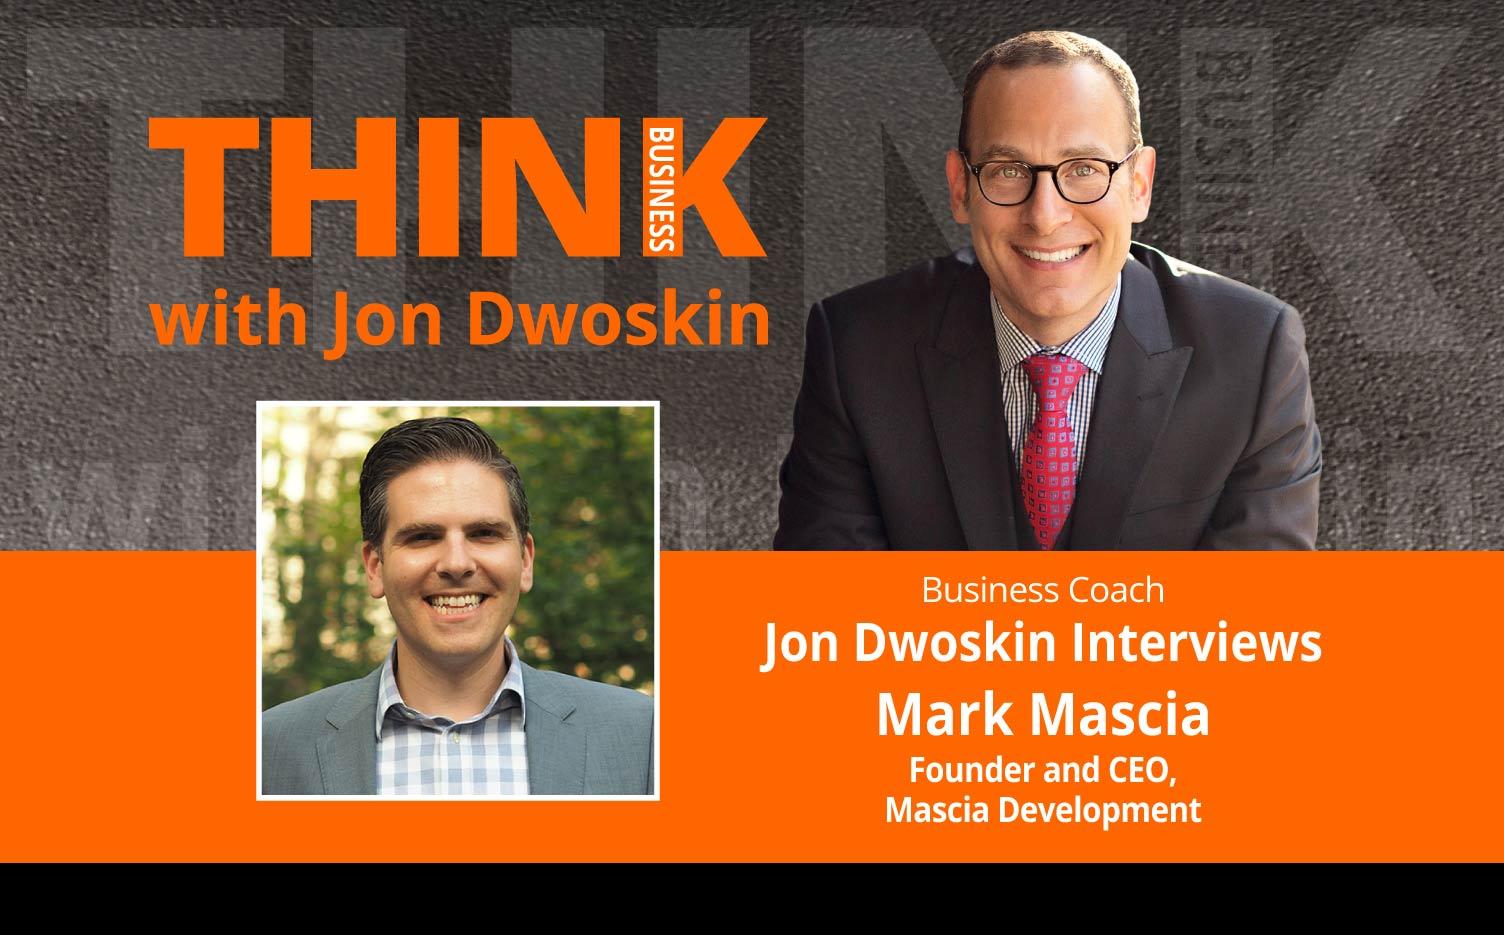 THINK Business Podcast: Jon Dwoskin Interviews Mark Mascia, Founder and CEO of Mascia Development